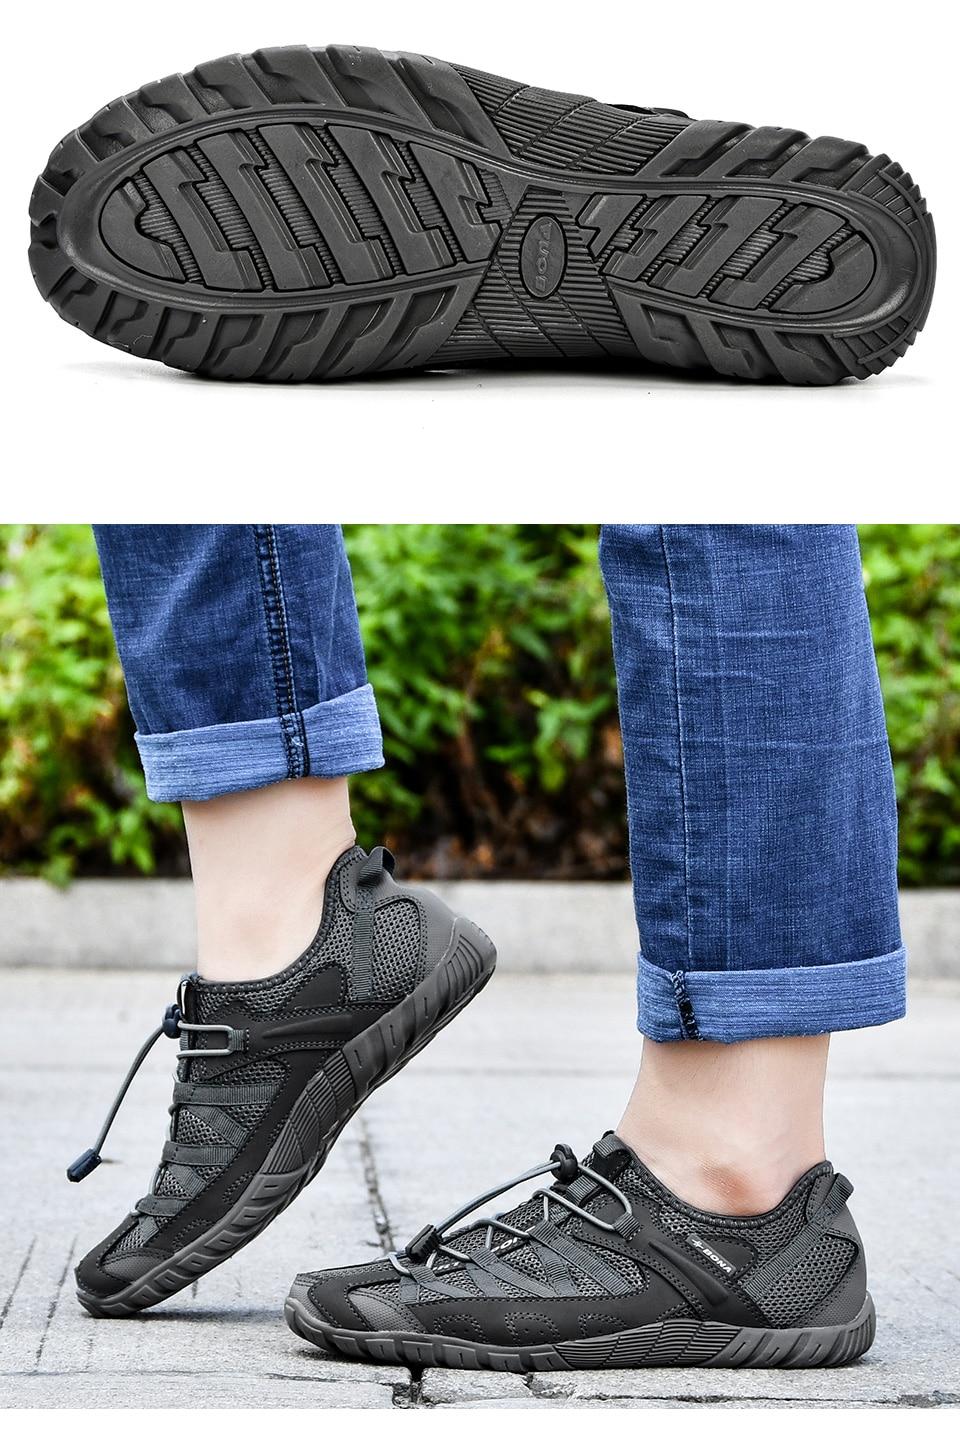 HTB1tEXVKk9WBuNjSspeq6yz5VXaC BONA 2018 Summer Sneakers Breathable Men Casual Shoes Fashion Men Shoes Tenis Masculino Adulto Sapato Masculino Men Leisure Shoe